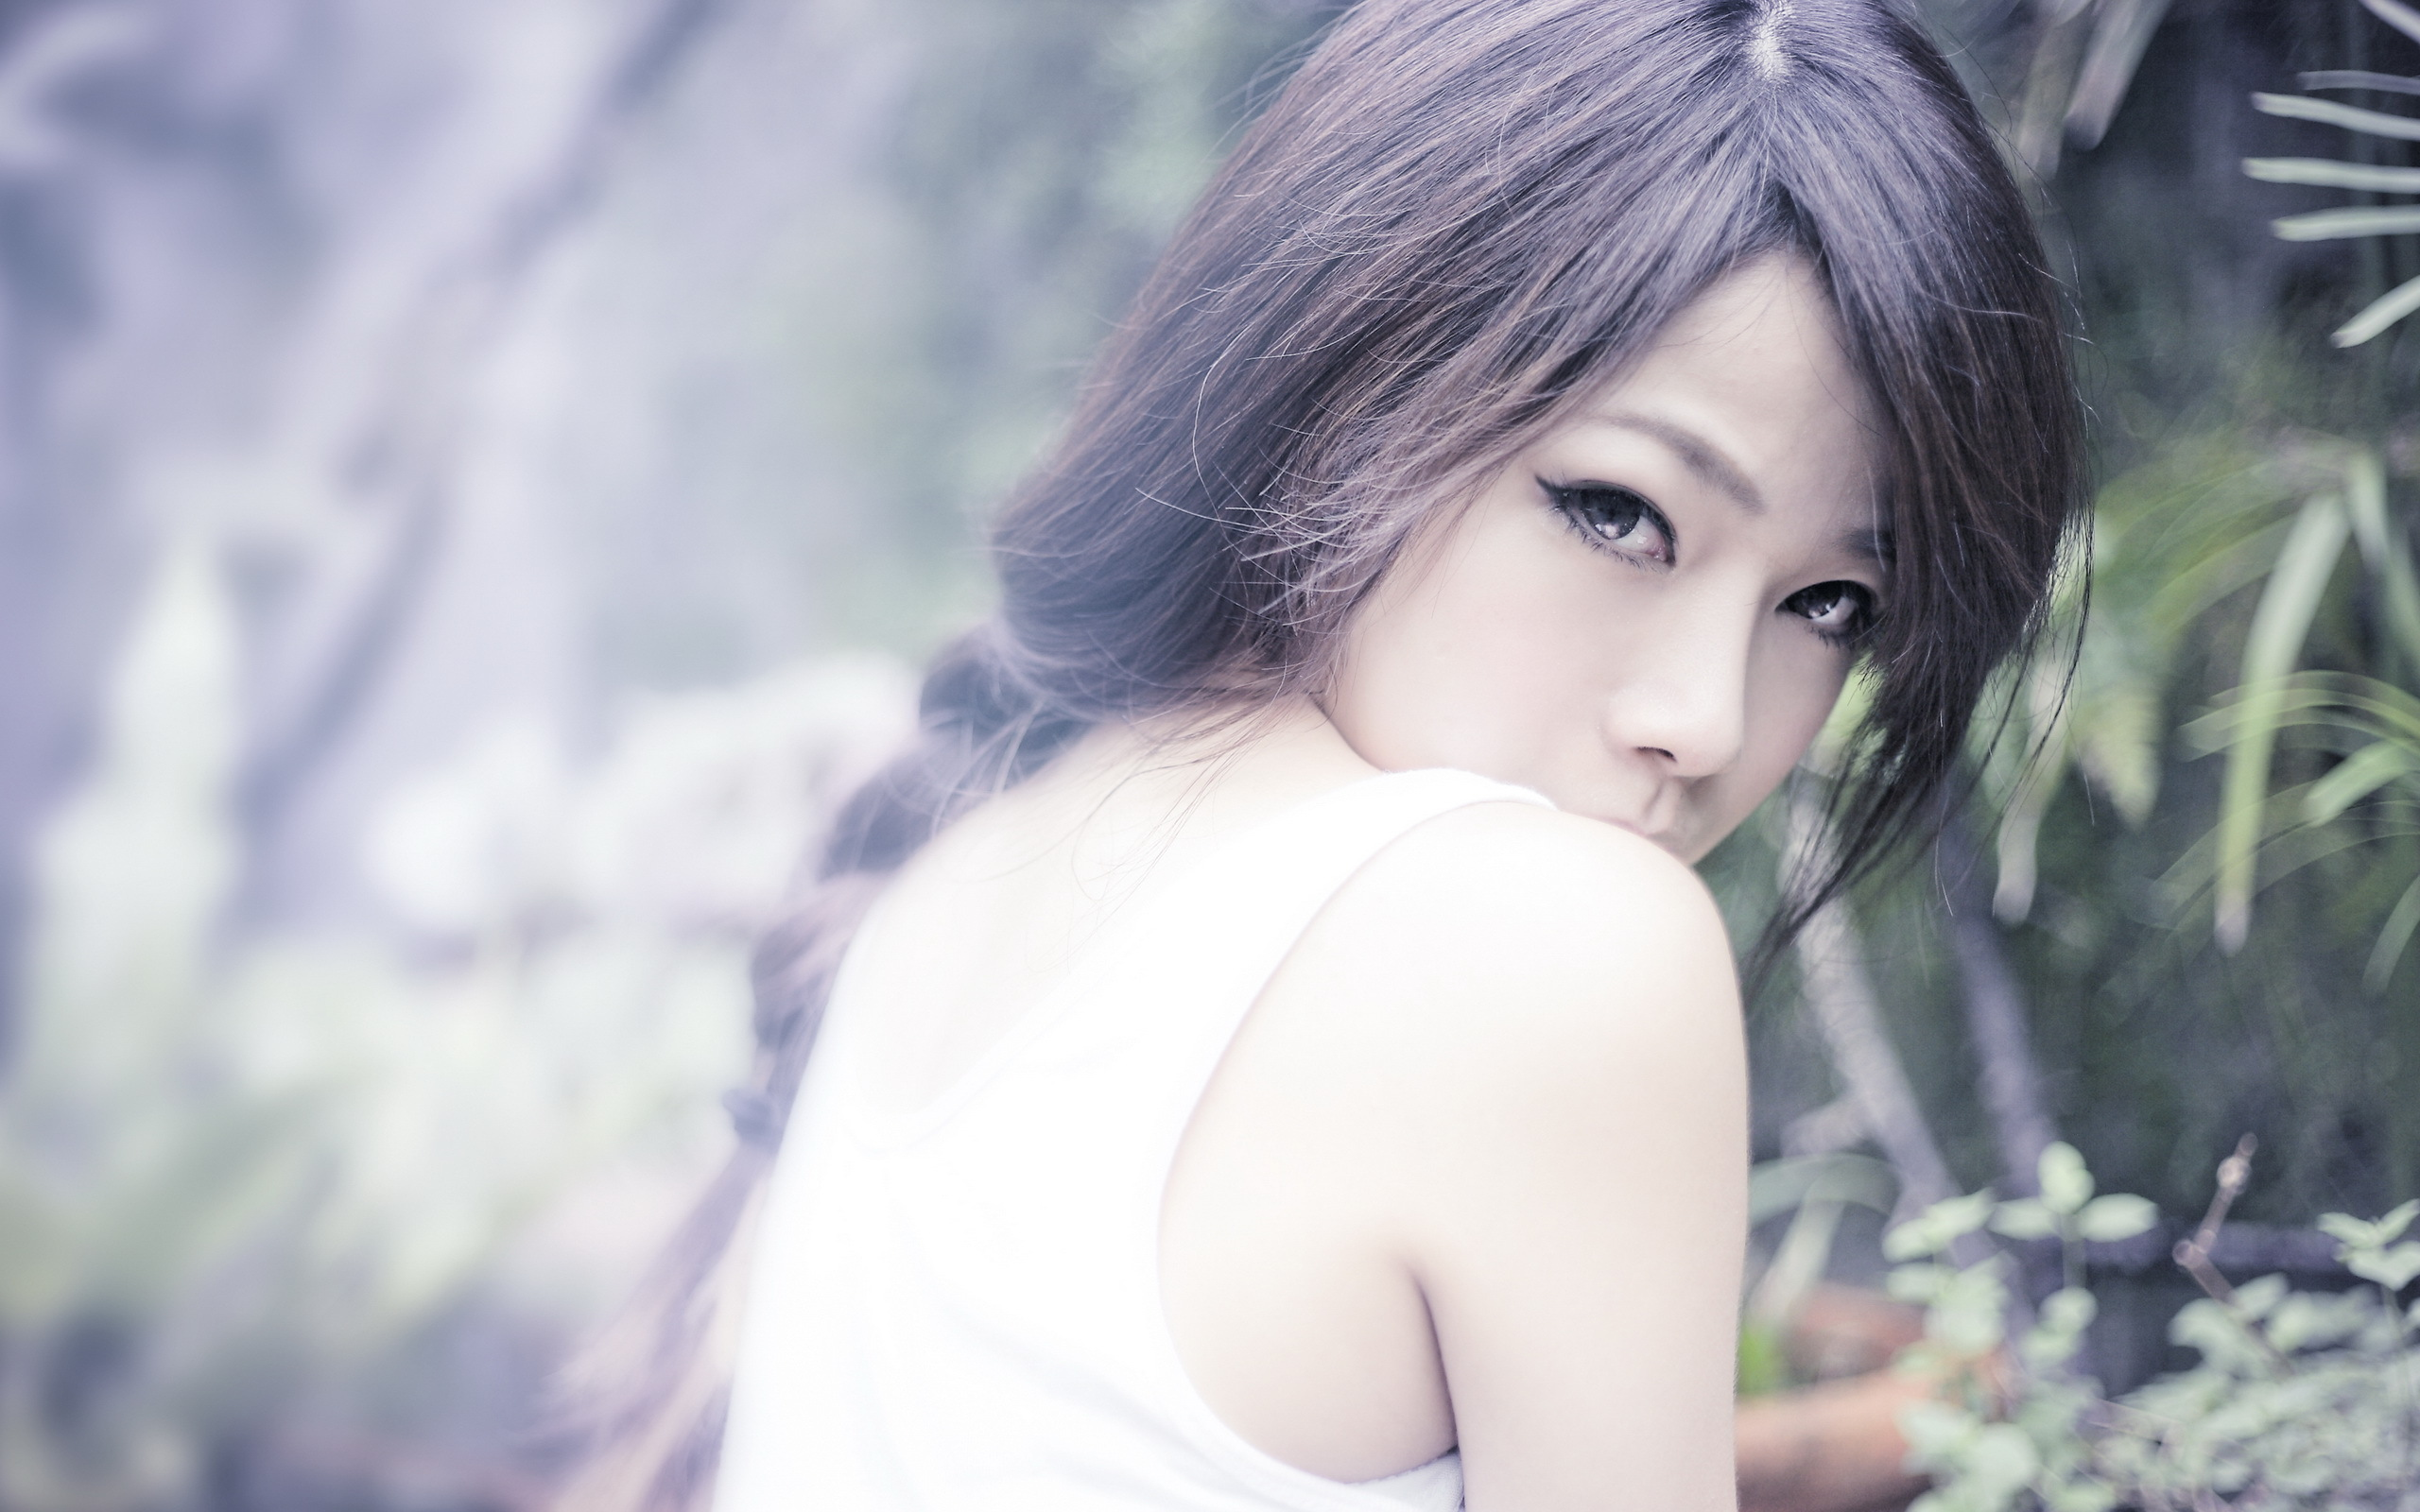 regard-half-asian-girls-as-beautiful